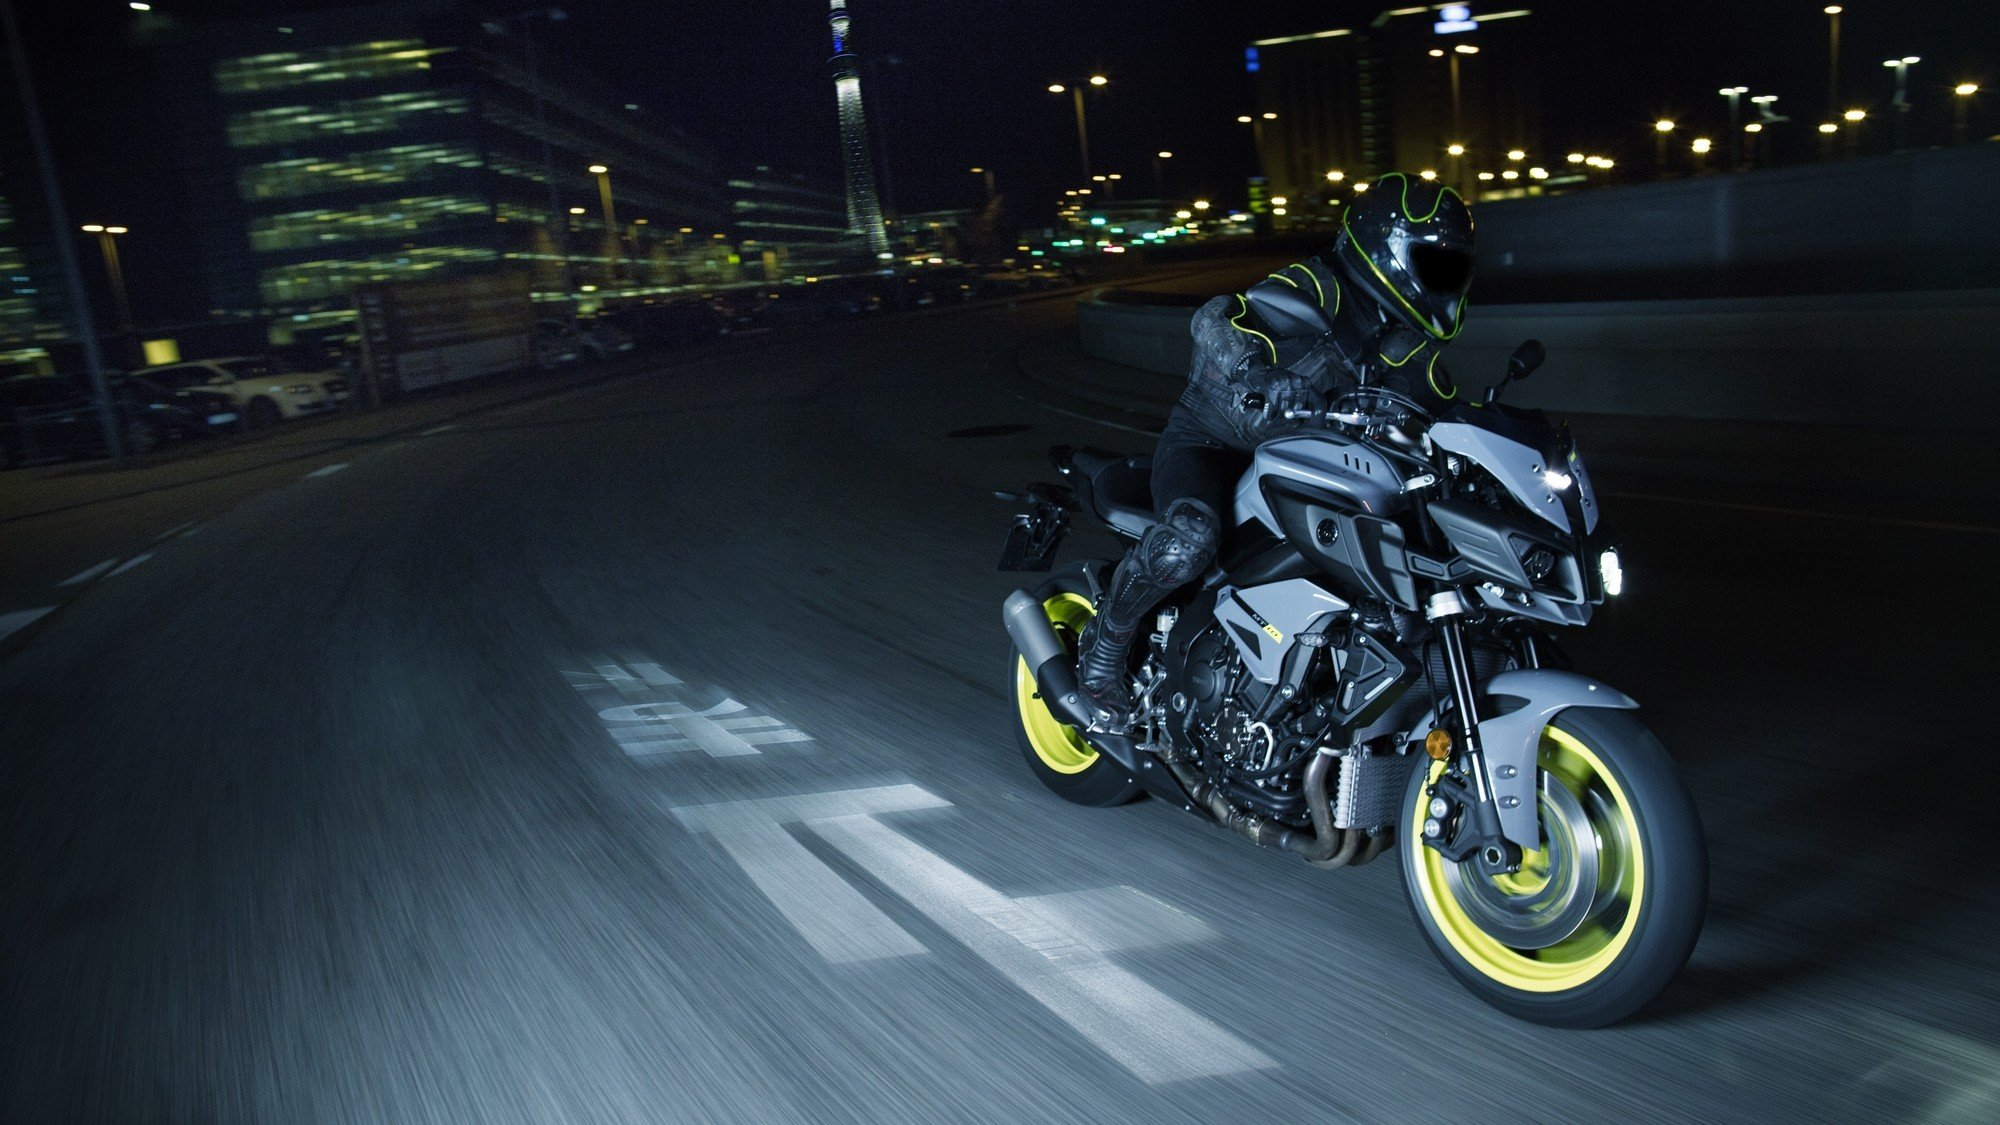 2016 yamaha mt 10 ray of darkness motorcycles wallpaper